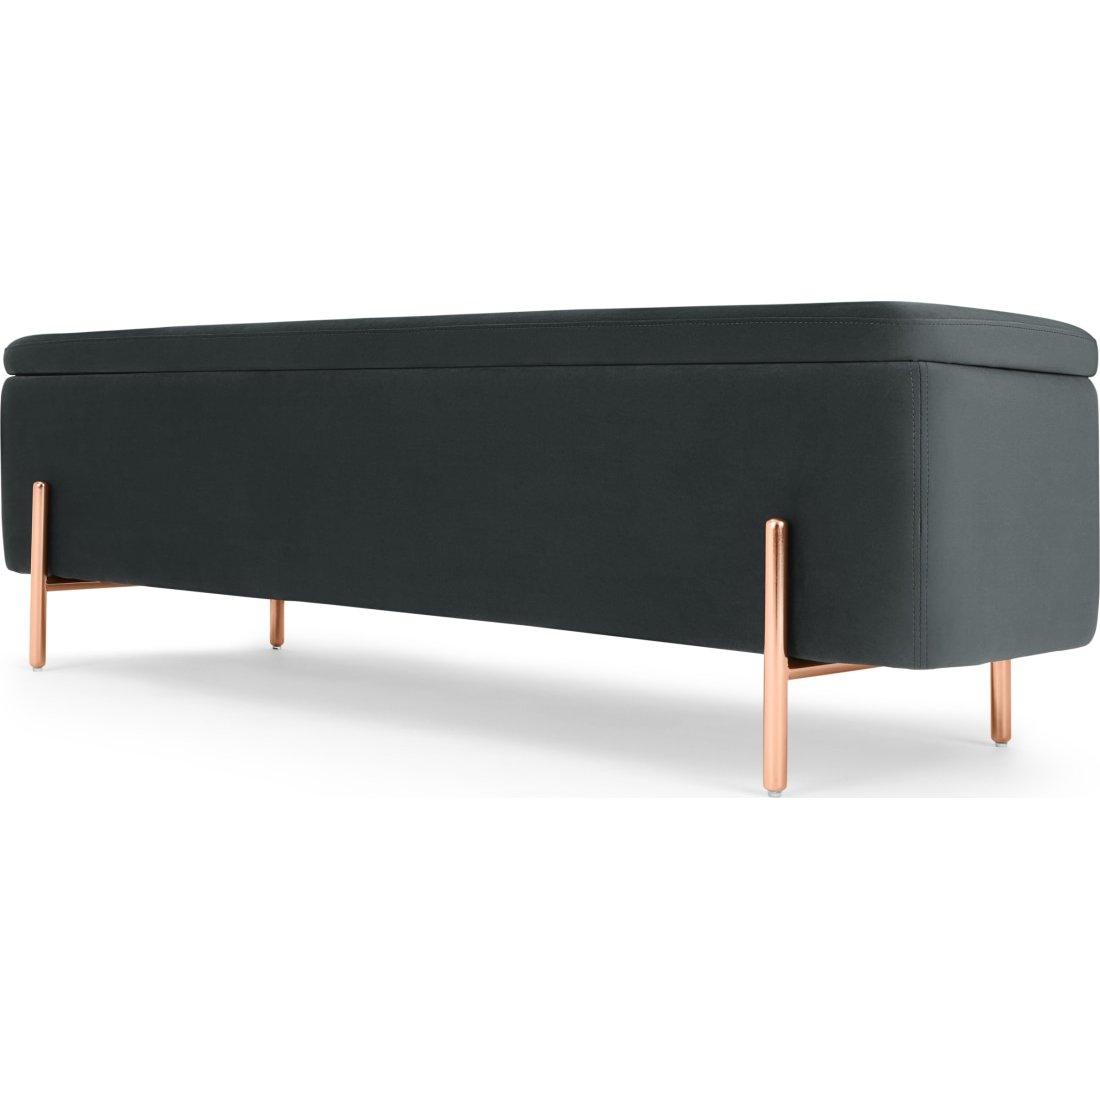 image-Asare 150cm Ottoman Storage Bench, Midnight Grey Velvet